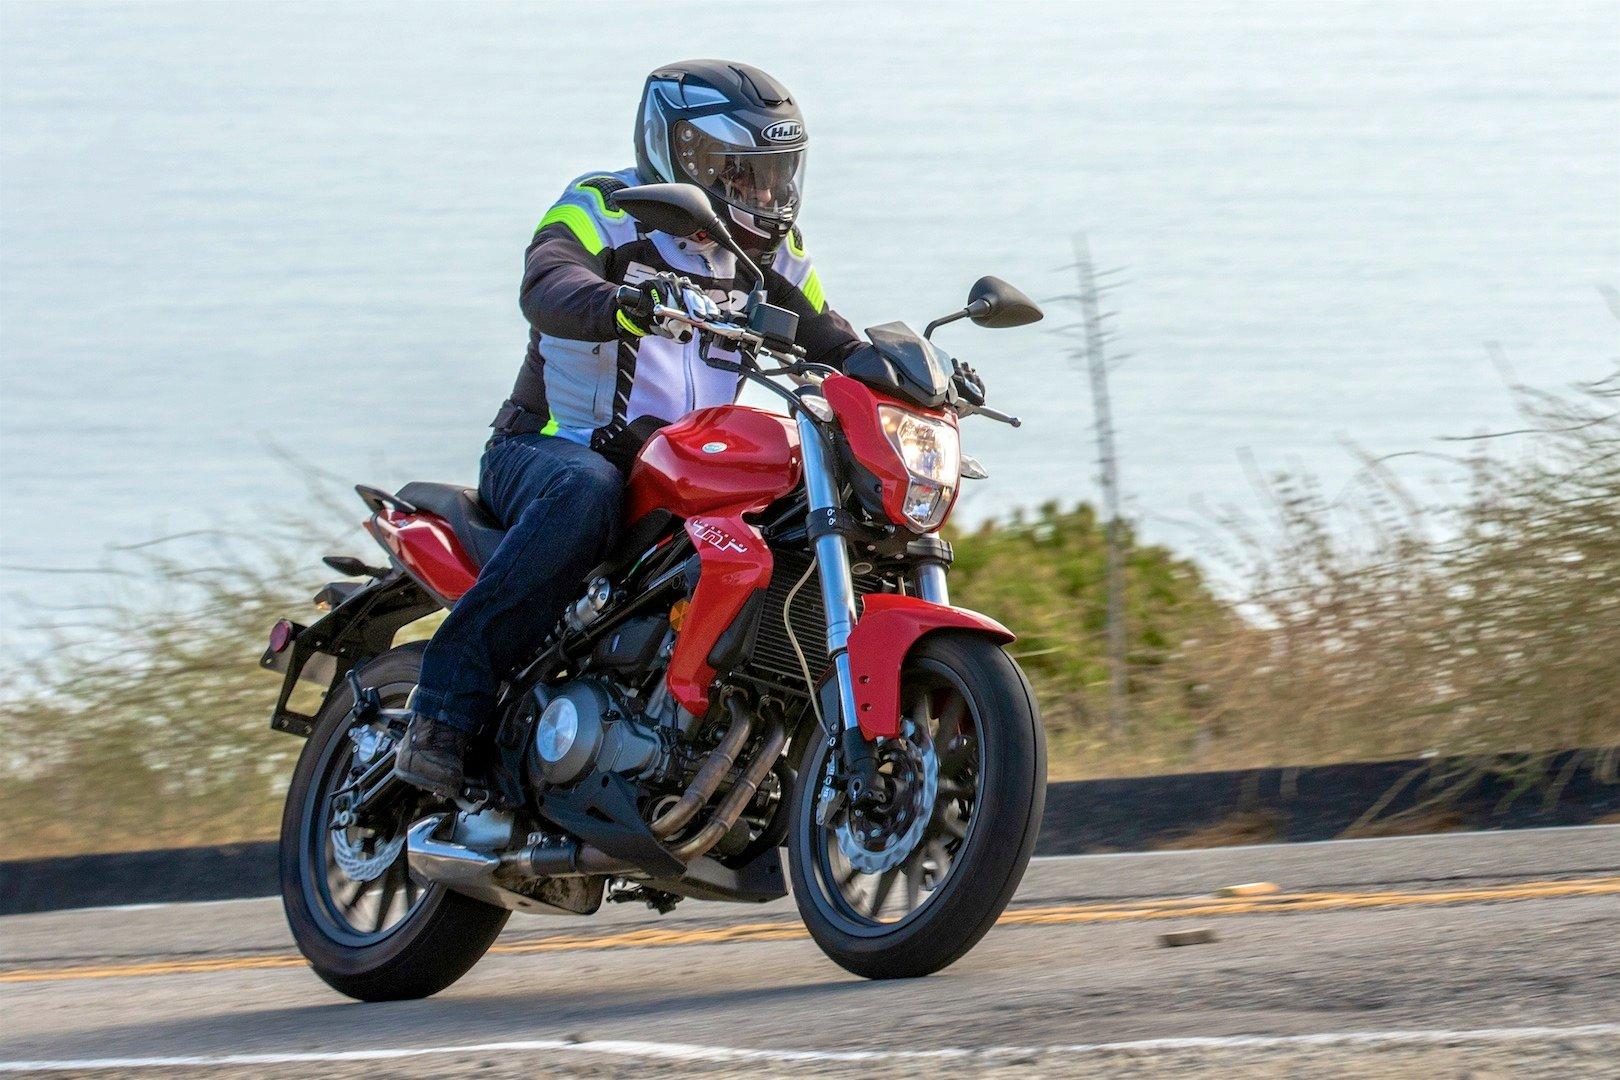 2019 Benelli Tornado TNT 300 Review - beginner motorcycle